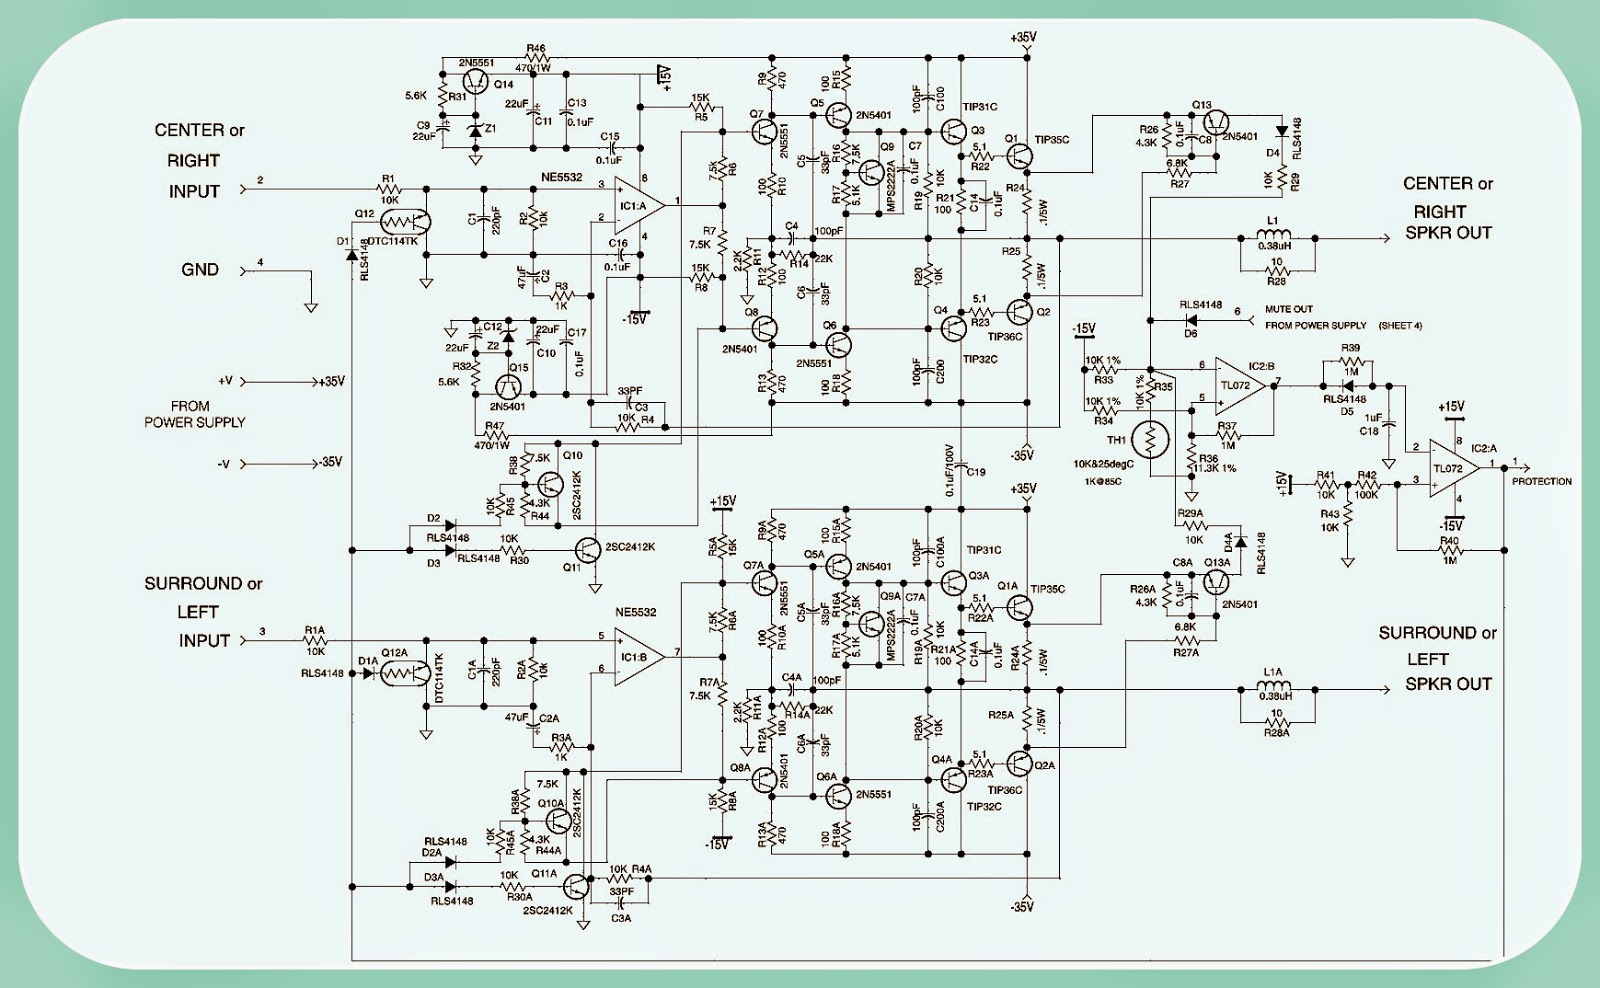 bass 550 jbl powered subwoofer schematic circuit diagram jbl powered subwoofer schematic diagram [ 1600 x 988 Pixel ]